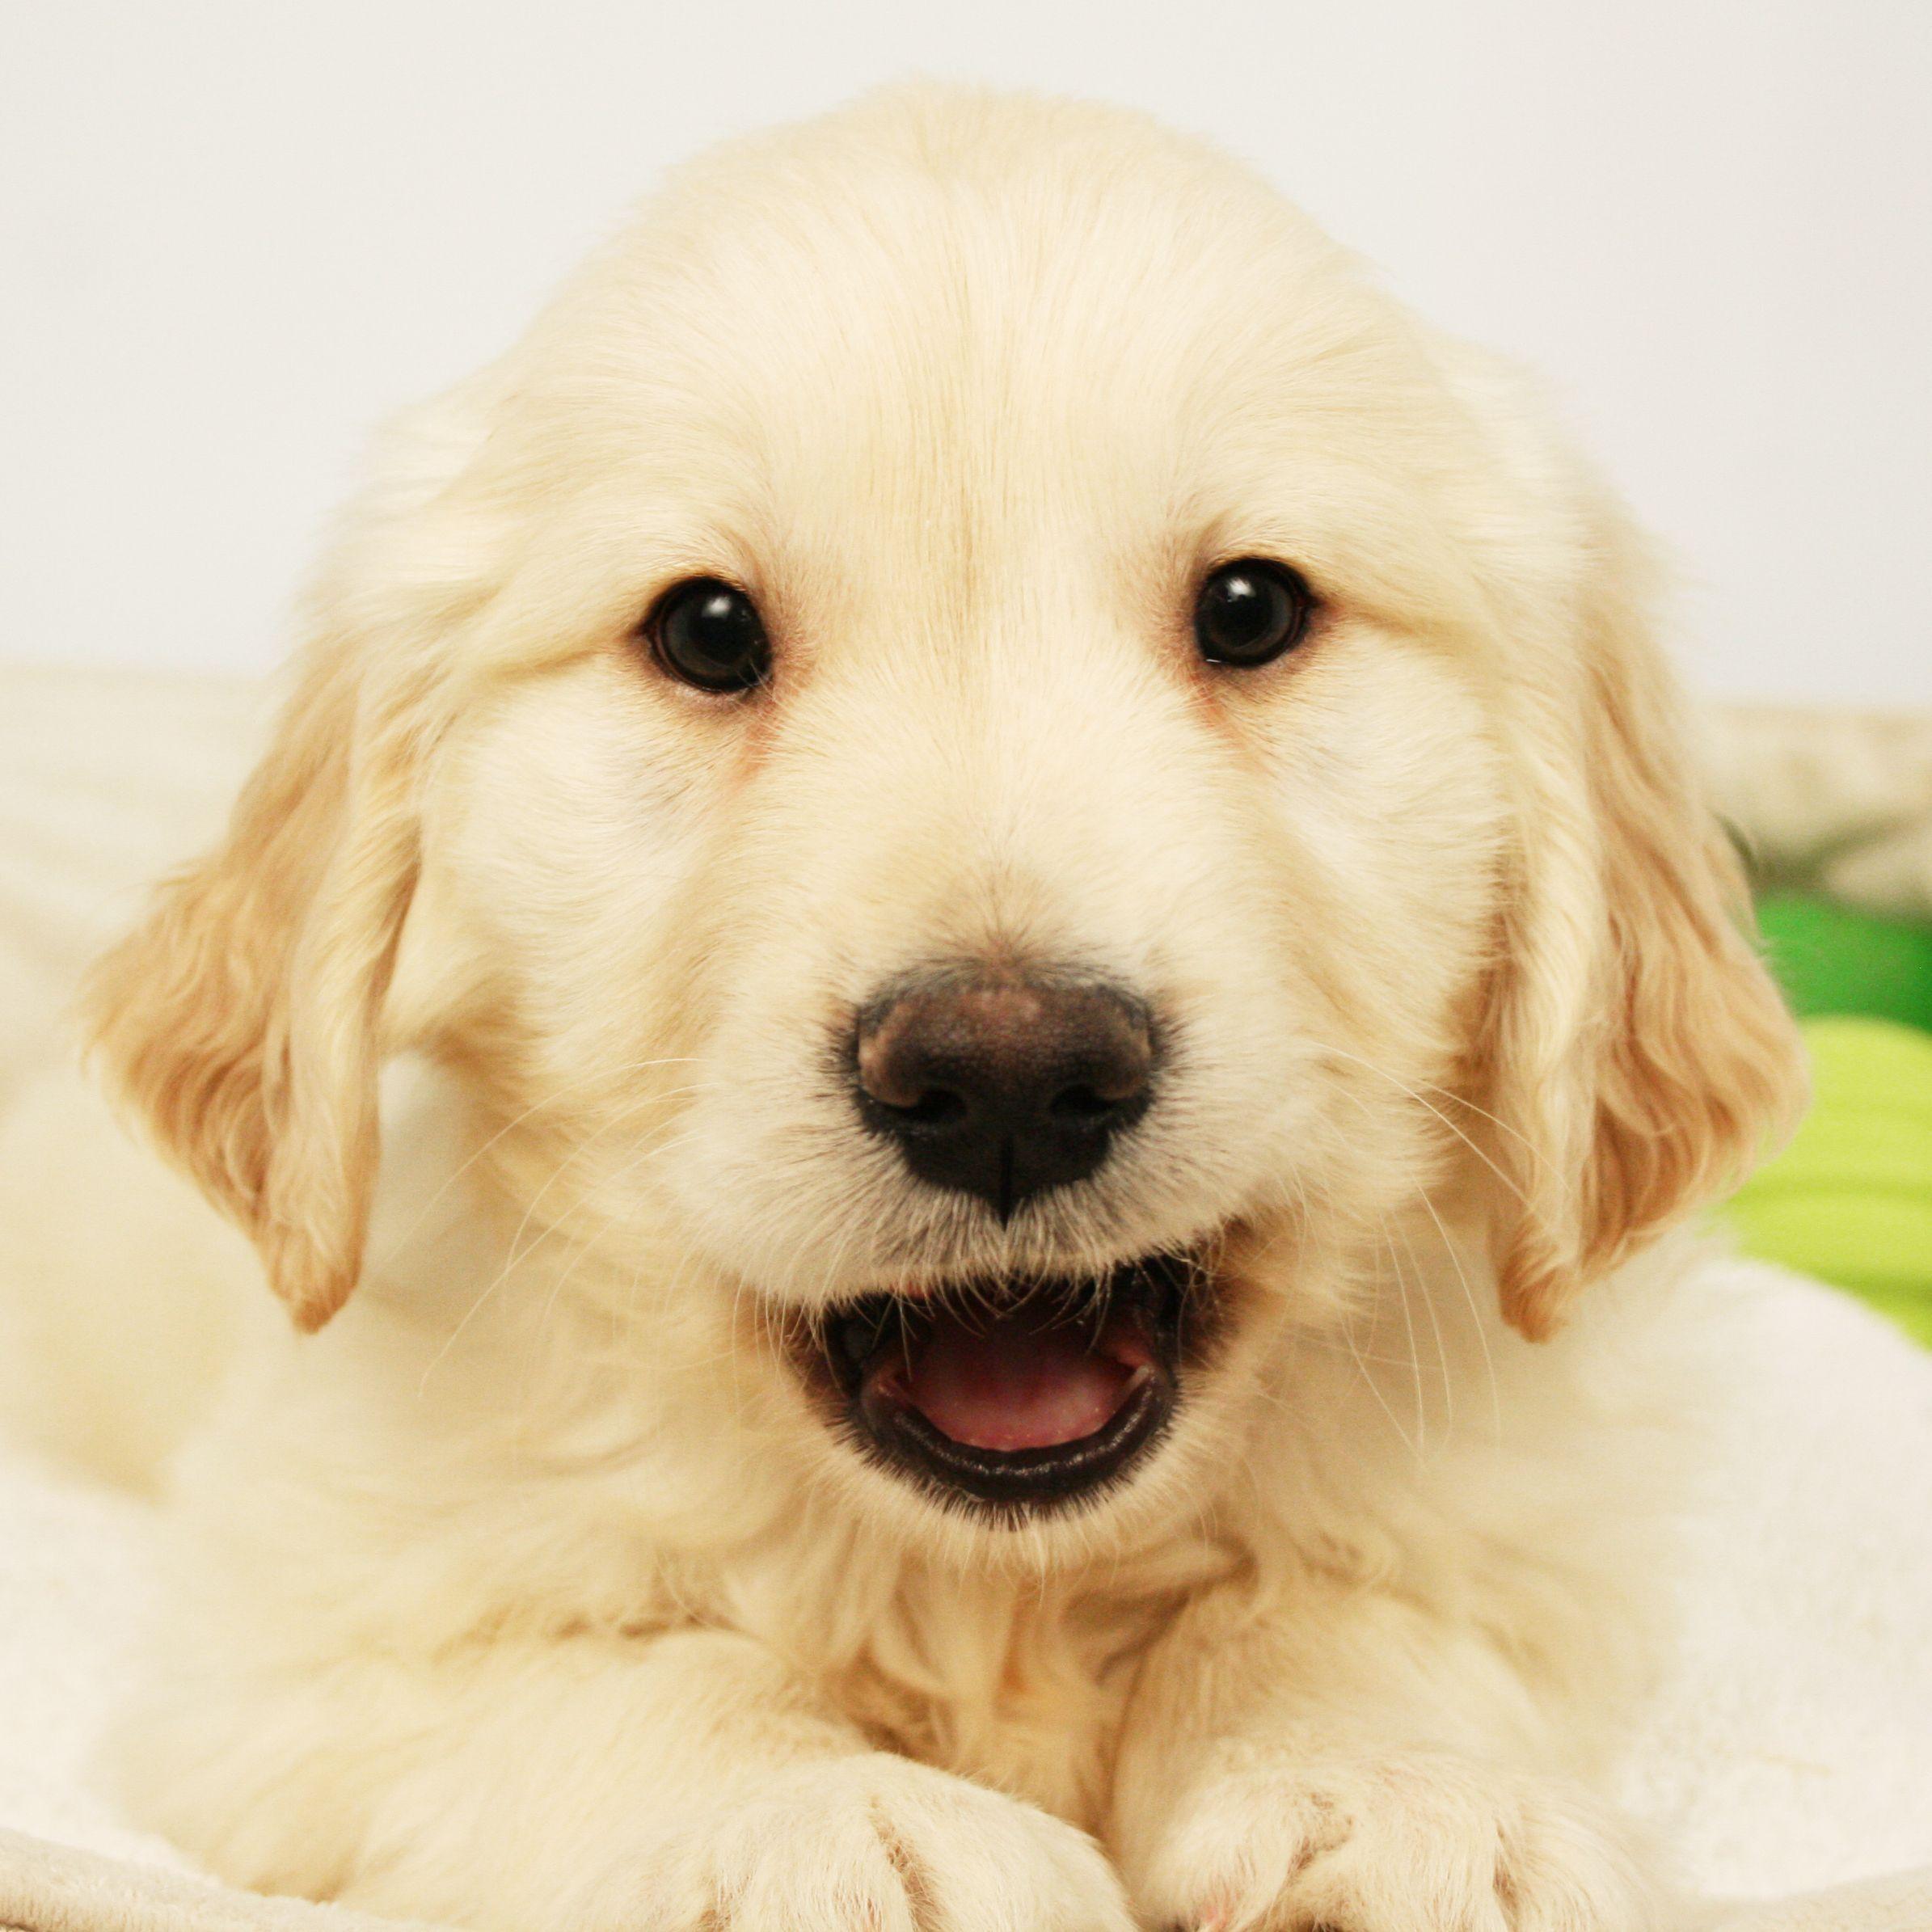 Golden Retriever Puppies Will Always Be Precious Goldenretriever Dogs Golden Retriever Golden Retriever Puppies